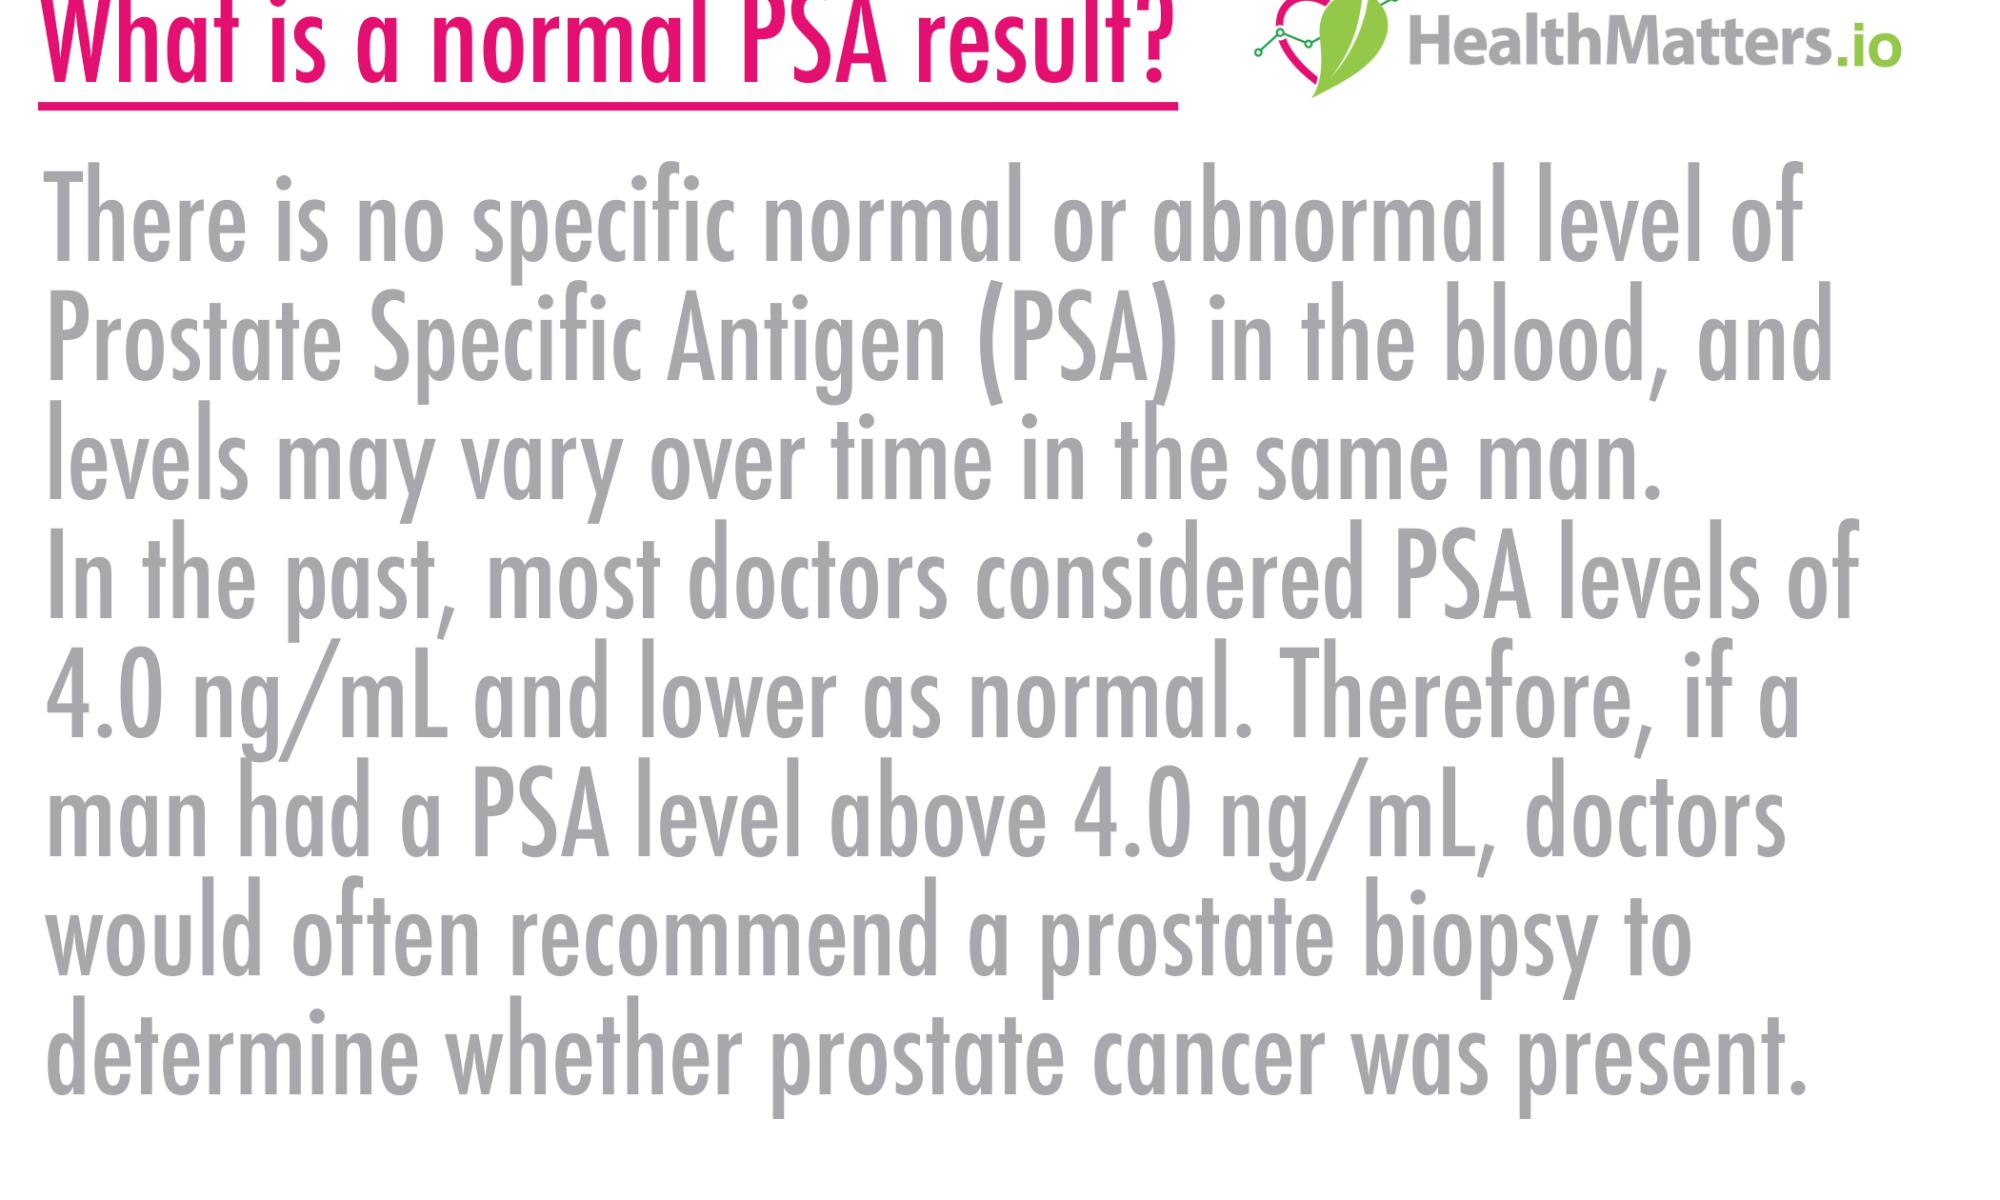 What is a normal PSA result? PSA prostate specific antigen